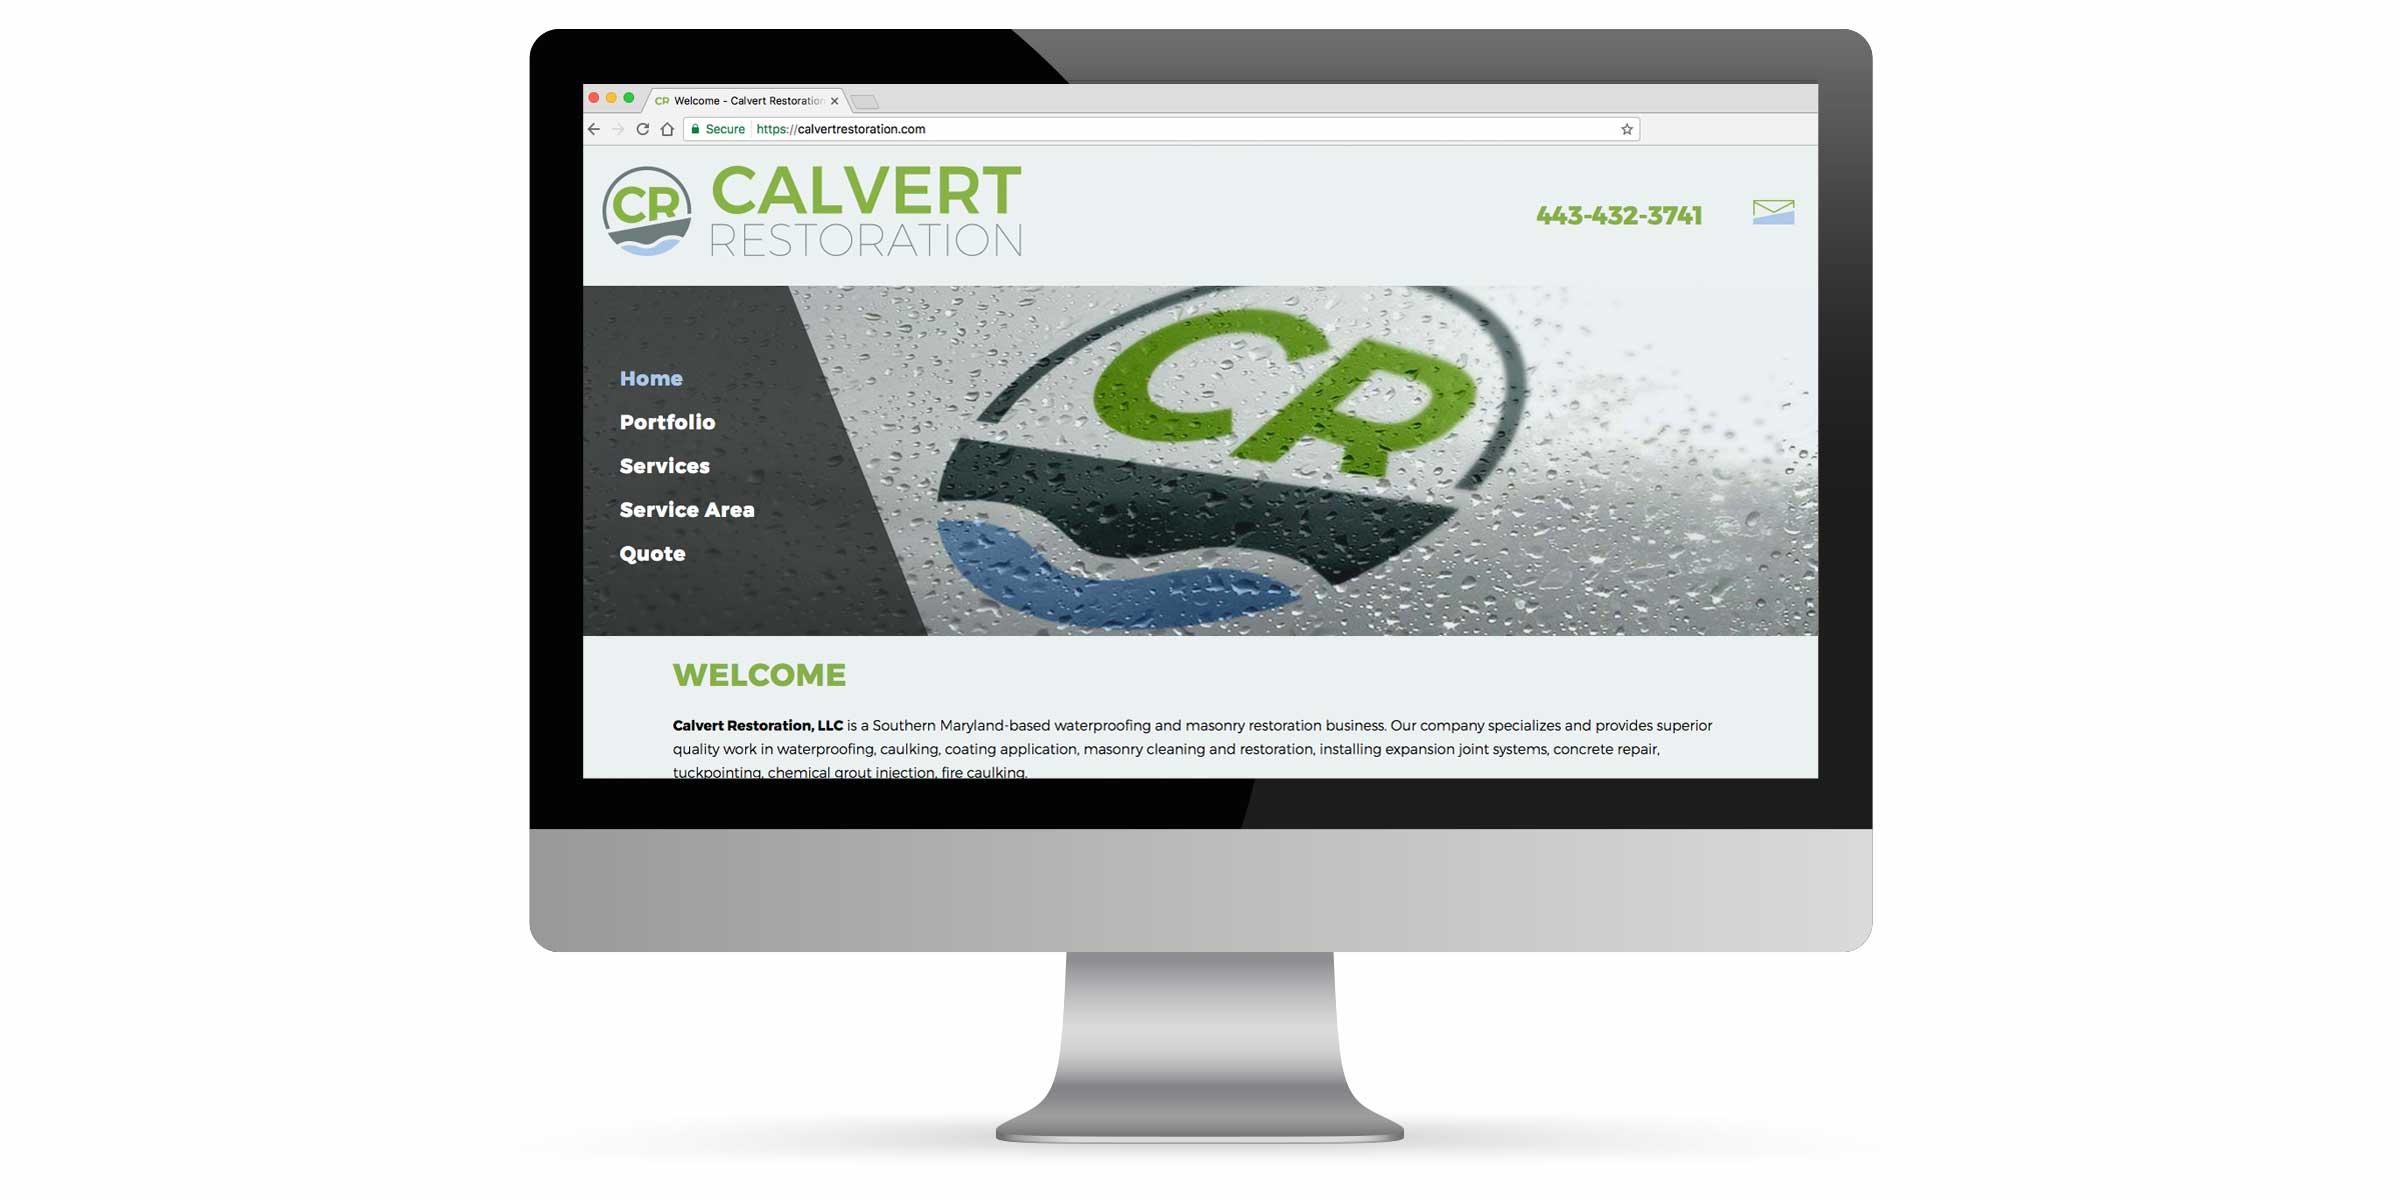 Calvert Restoration WebsitePortfolio